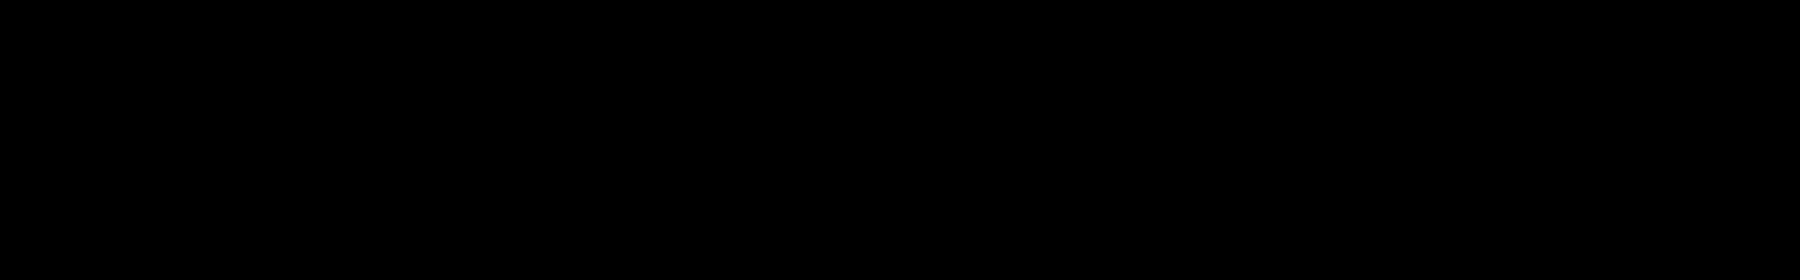 Andromeda Techno audio waveform